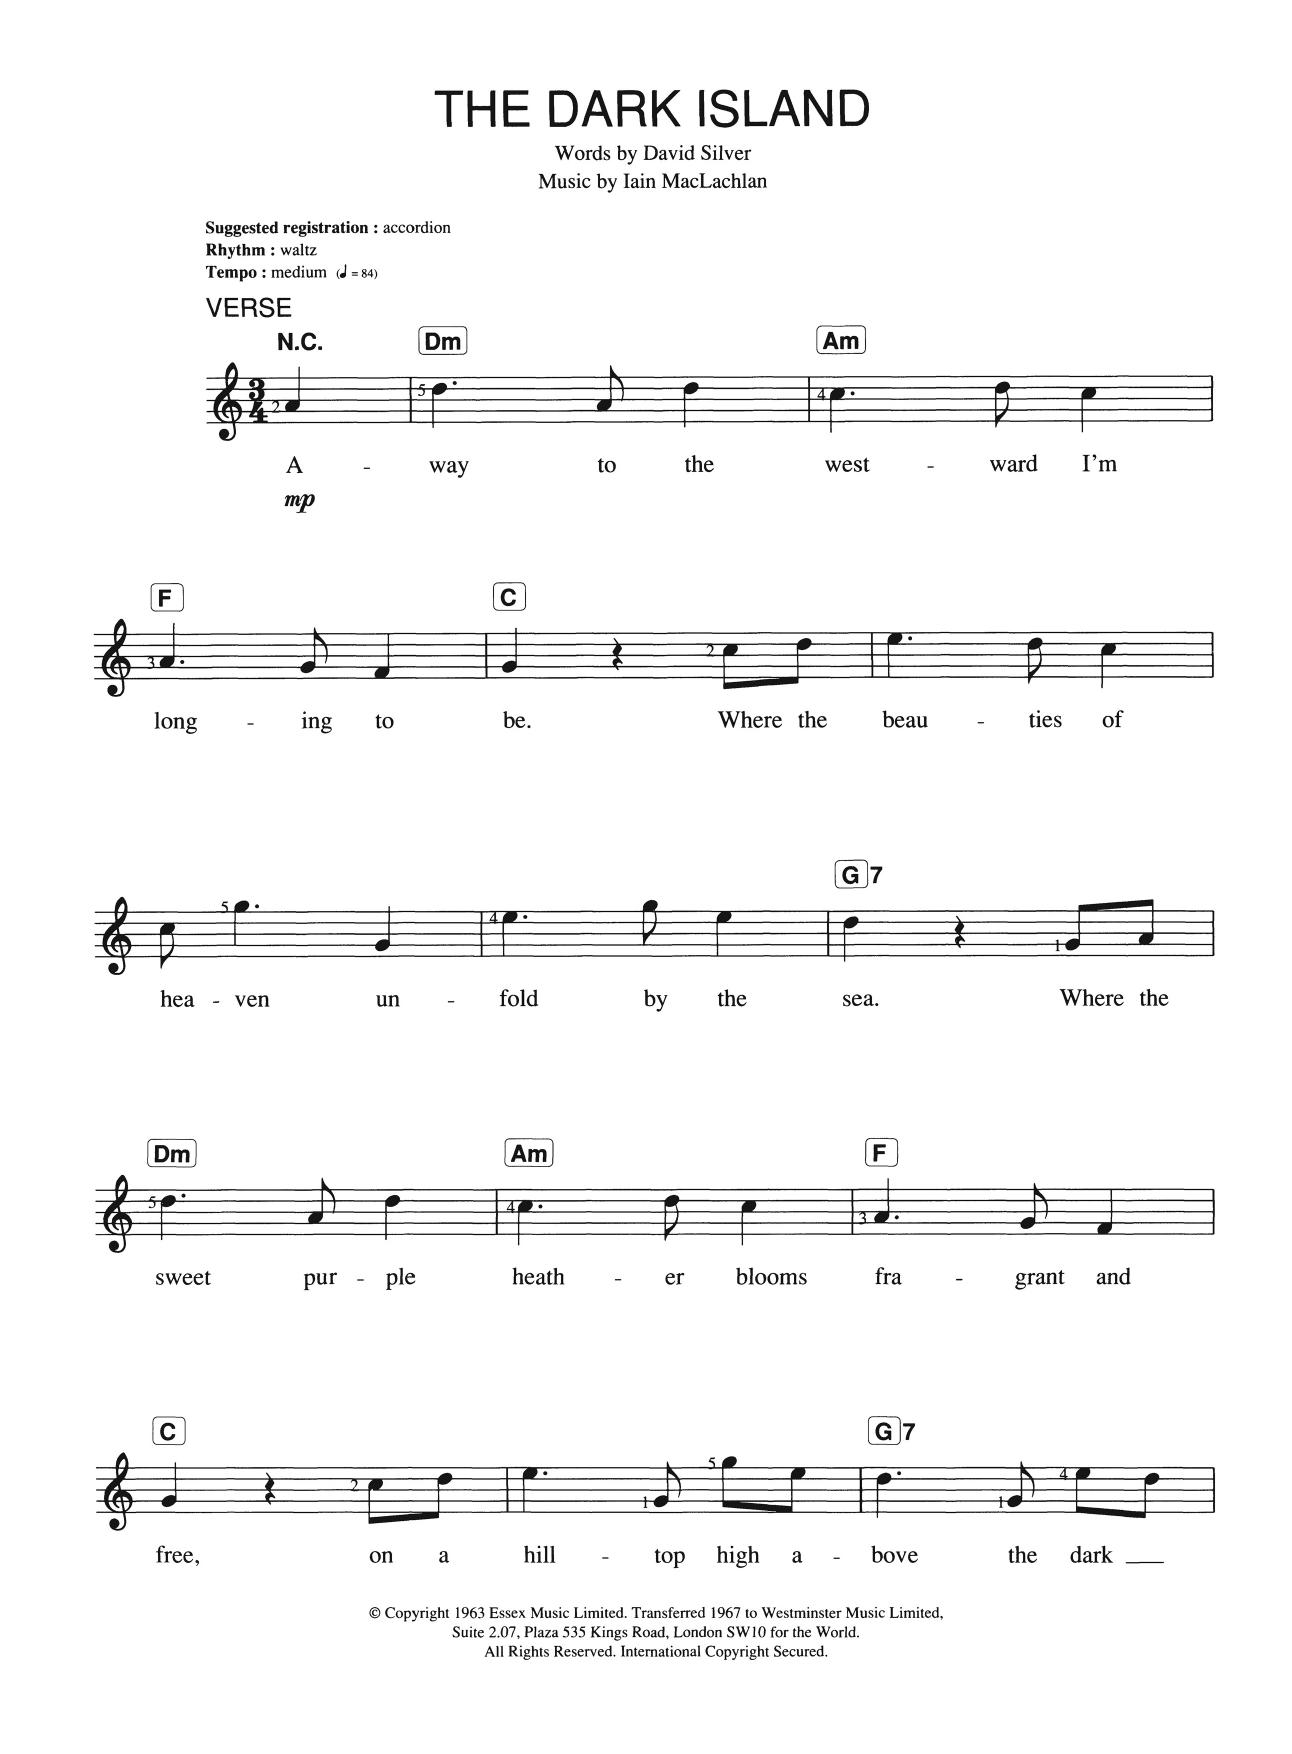 The Dark Island Sheet Music